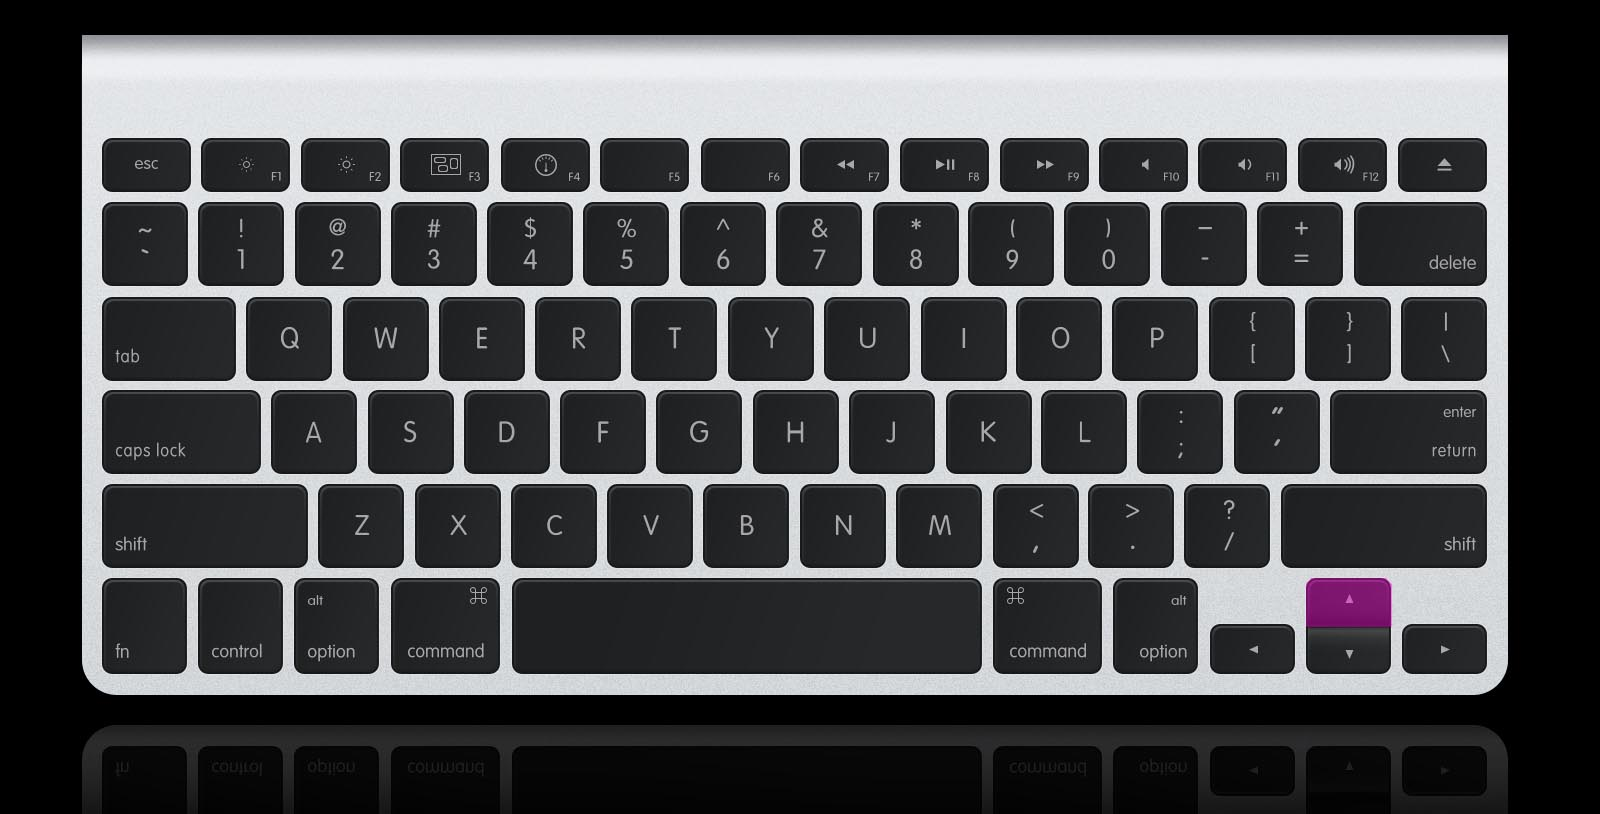 jam-keyboard